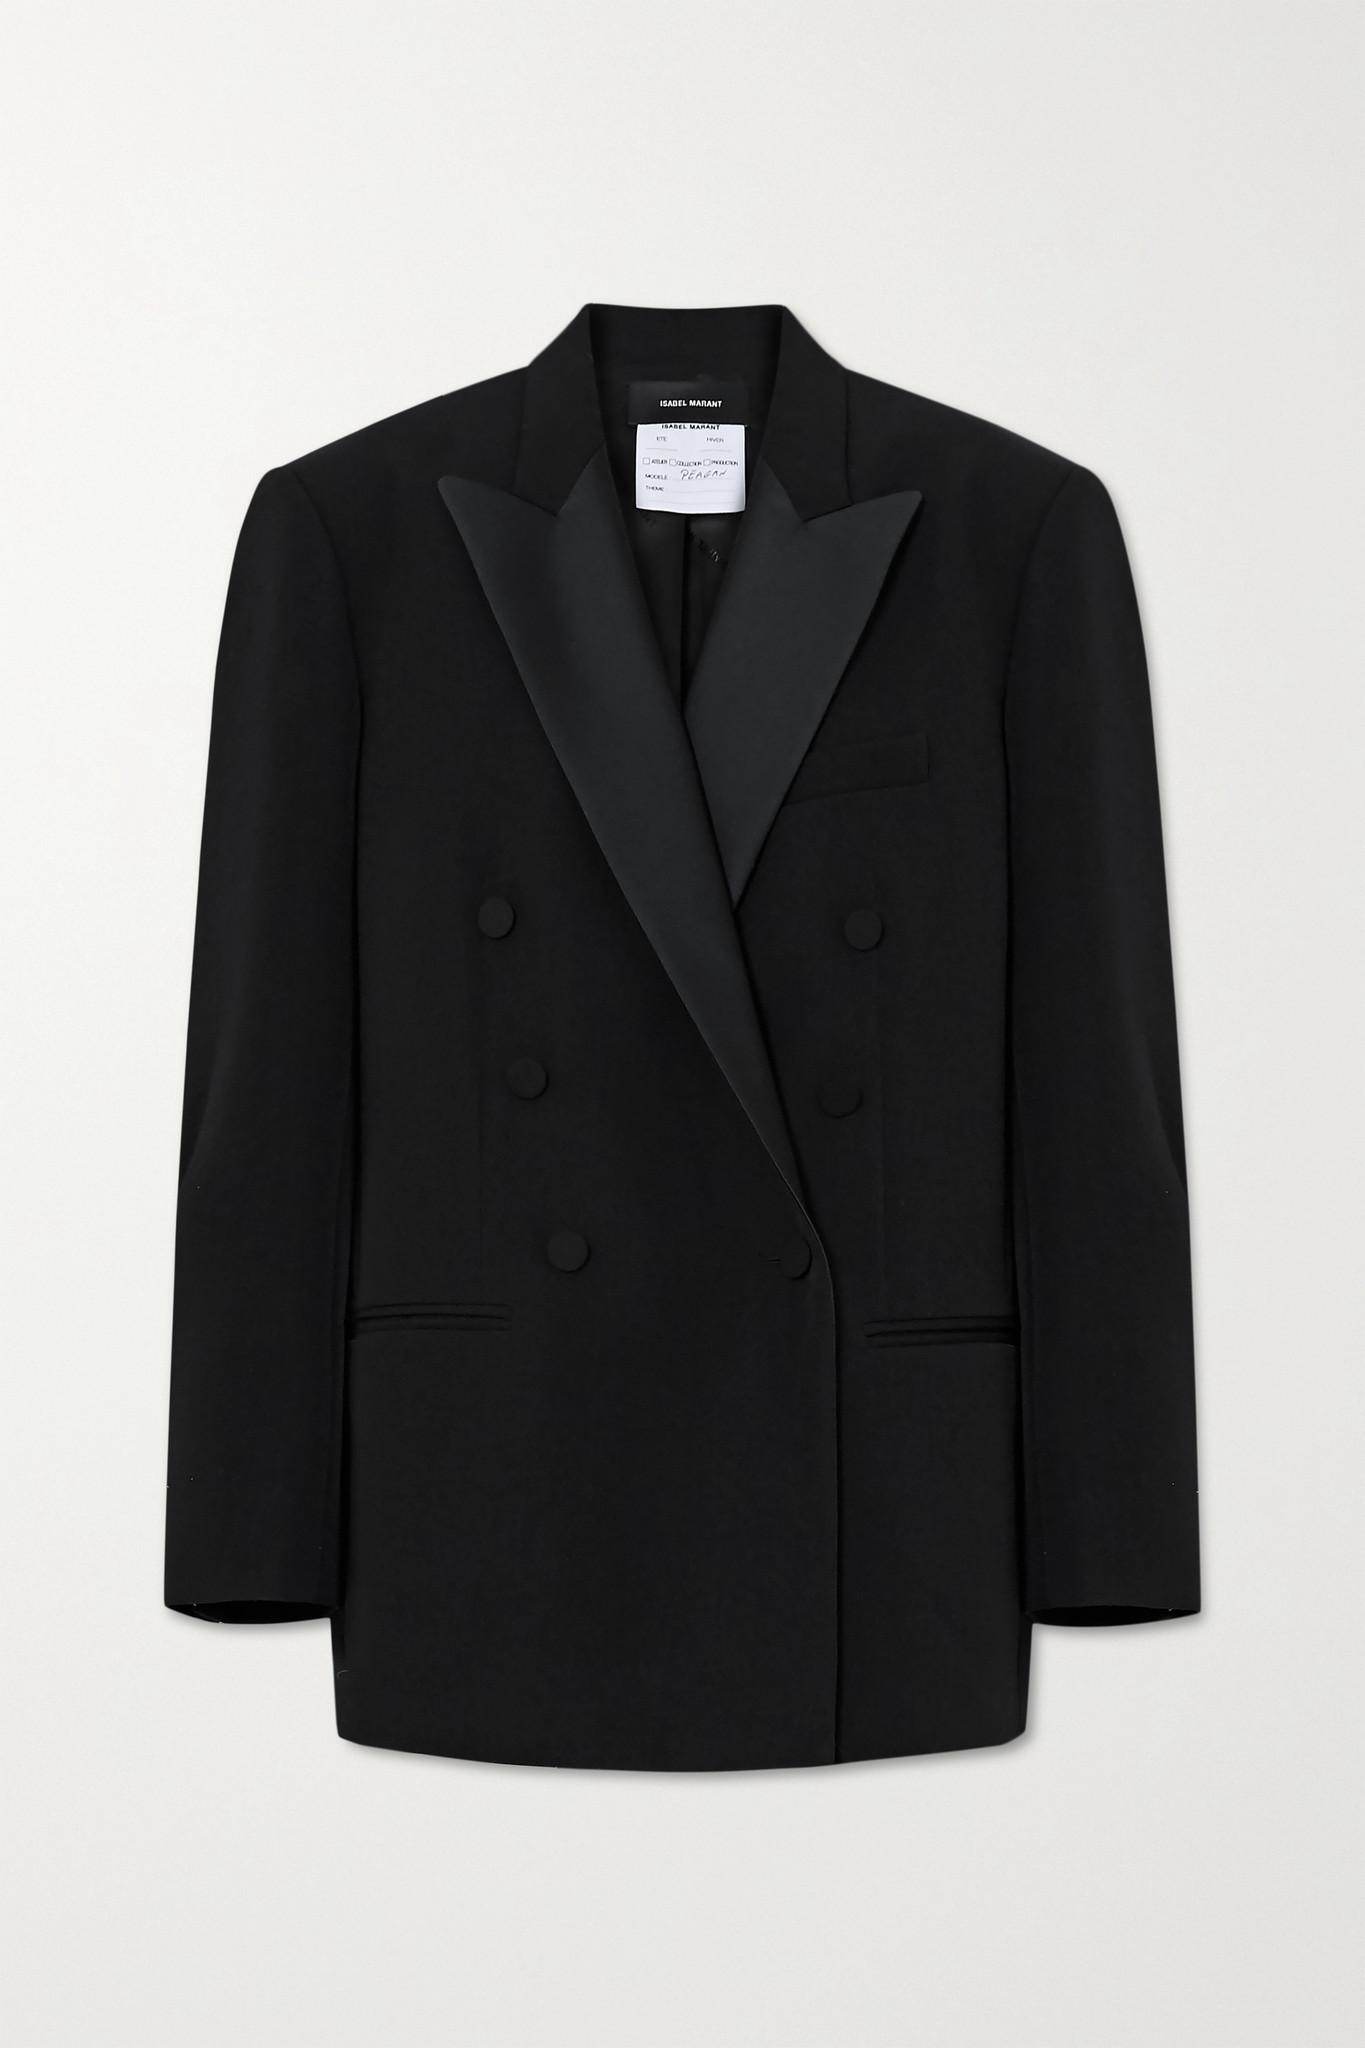 ISABEL MARANT - Double-breasted Satin-trimmed Wool Blazer - Black - FR34